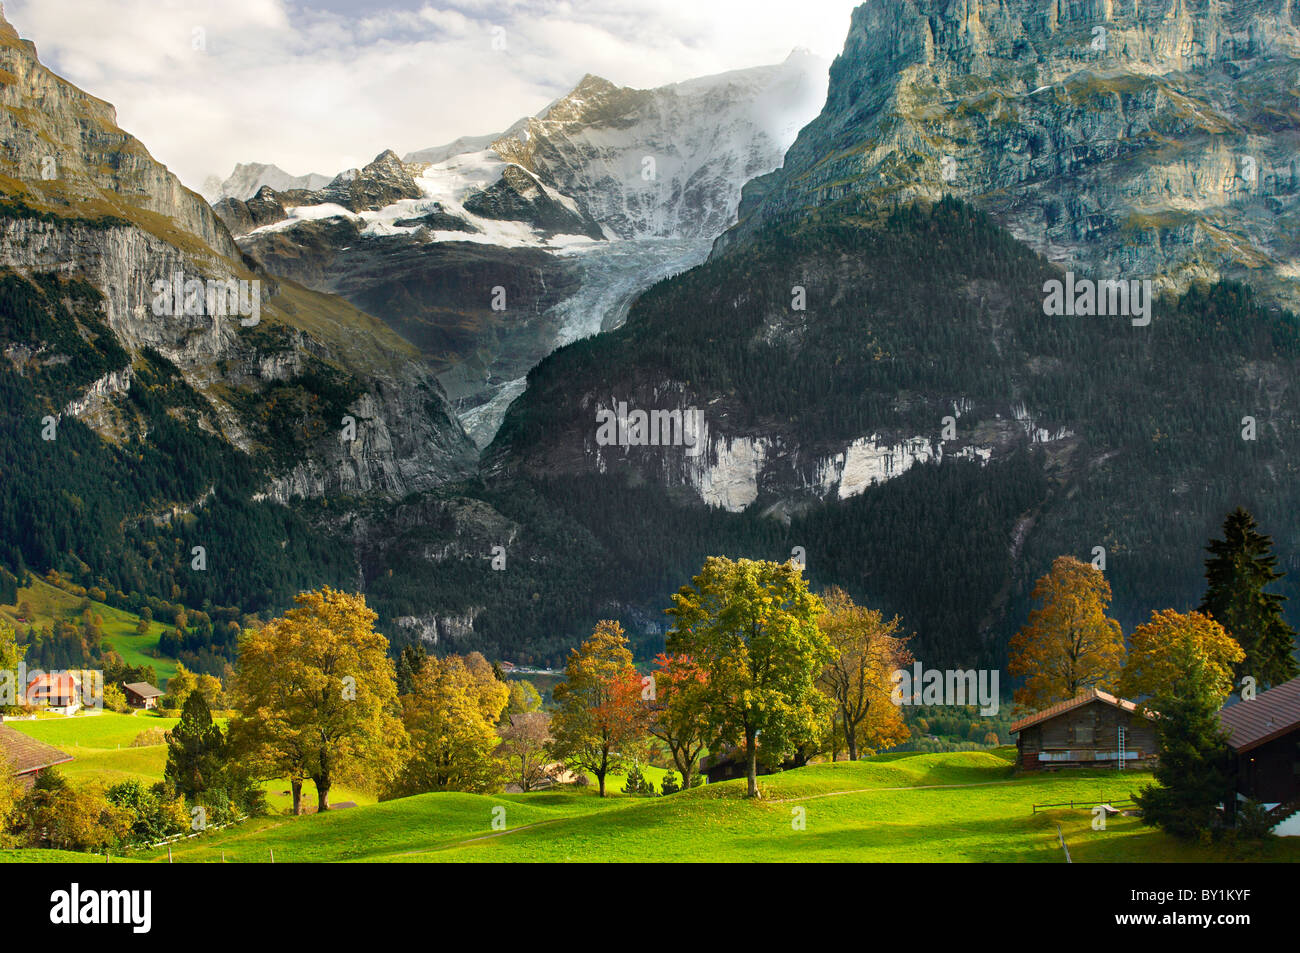 Swiss houses on high Alpine pastures - Grindelwald Switzerland - Stock Image